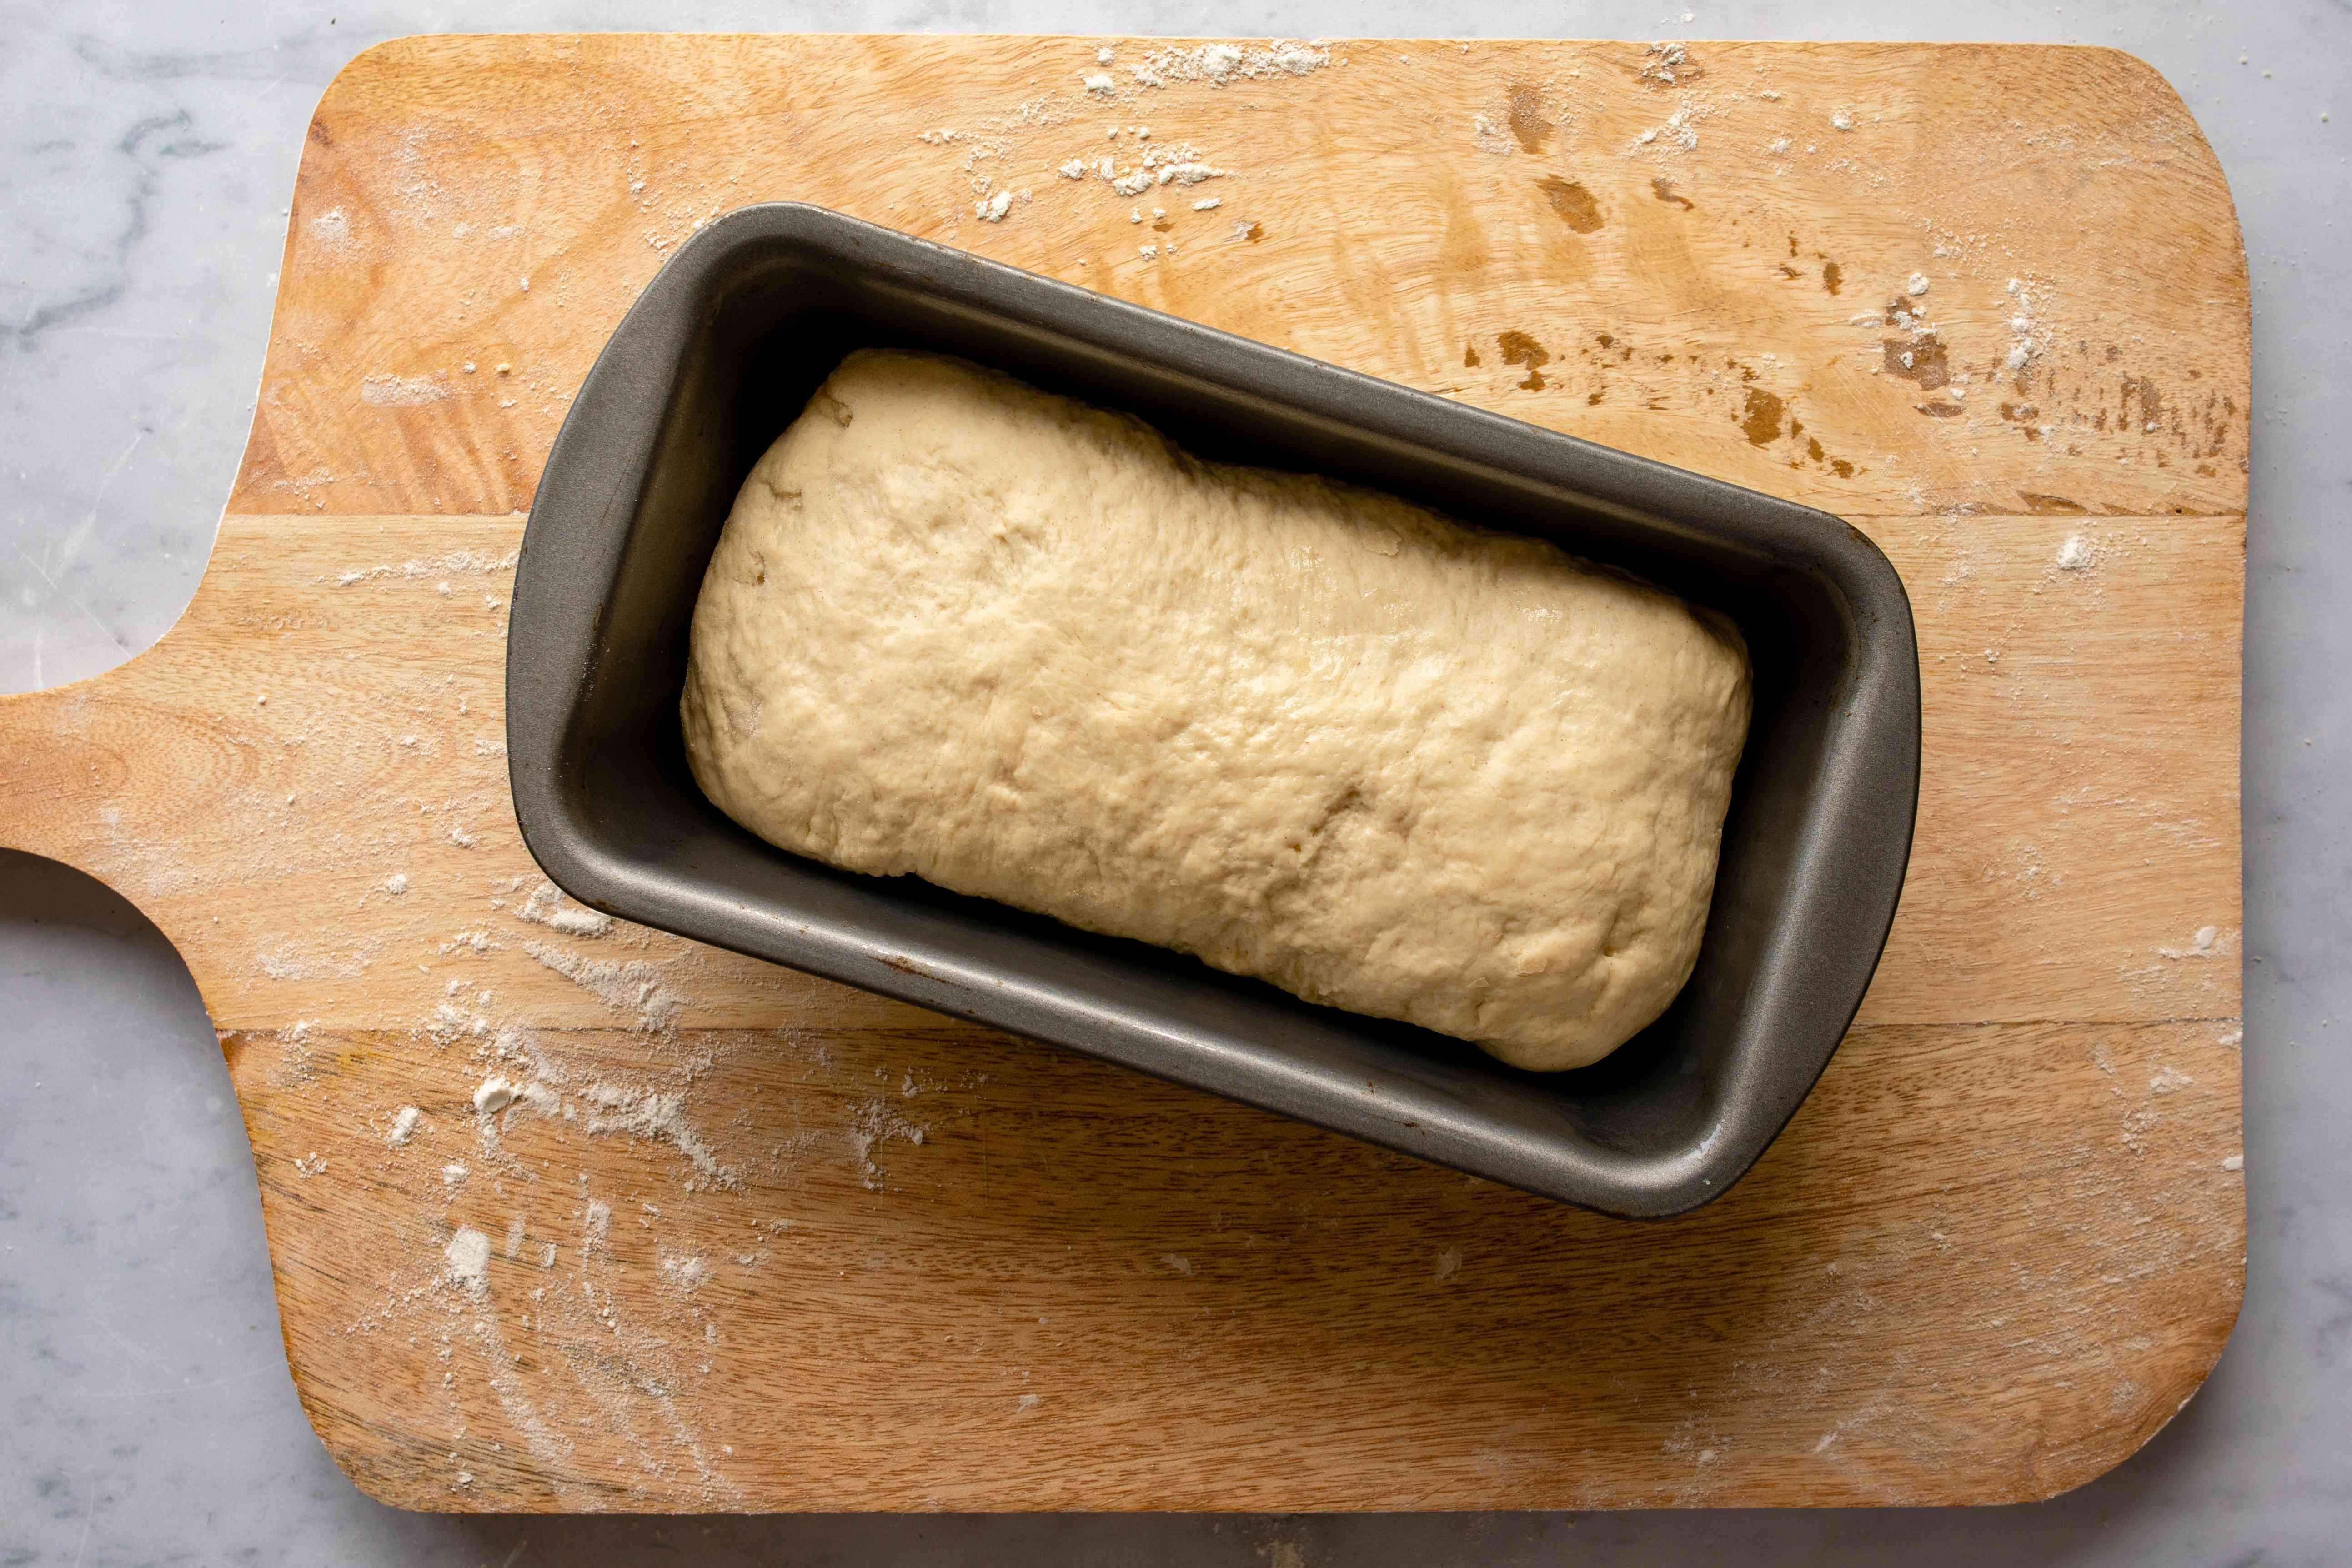 The dough in a metal bread pan